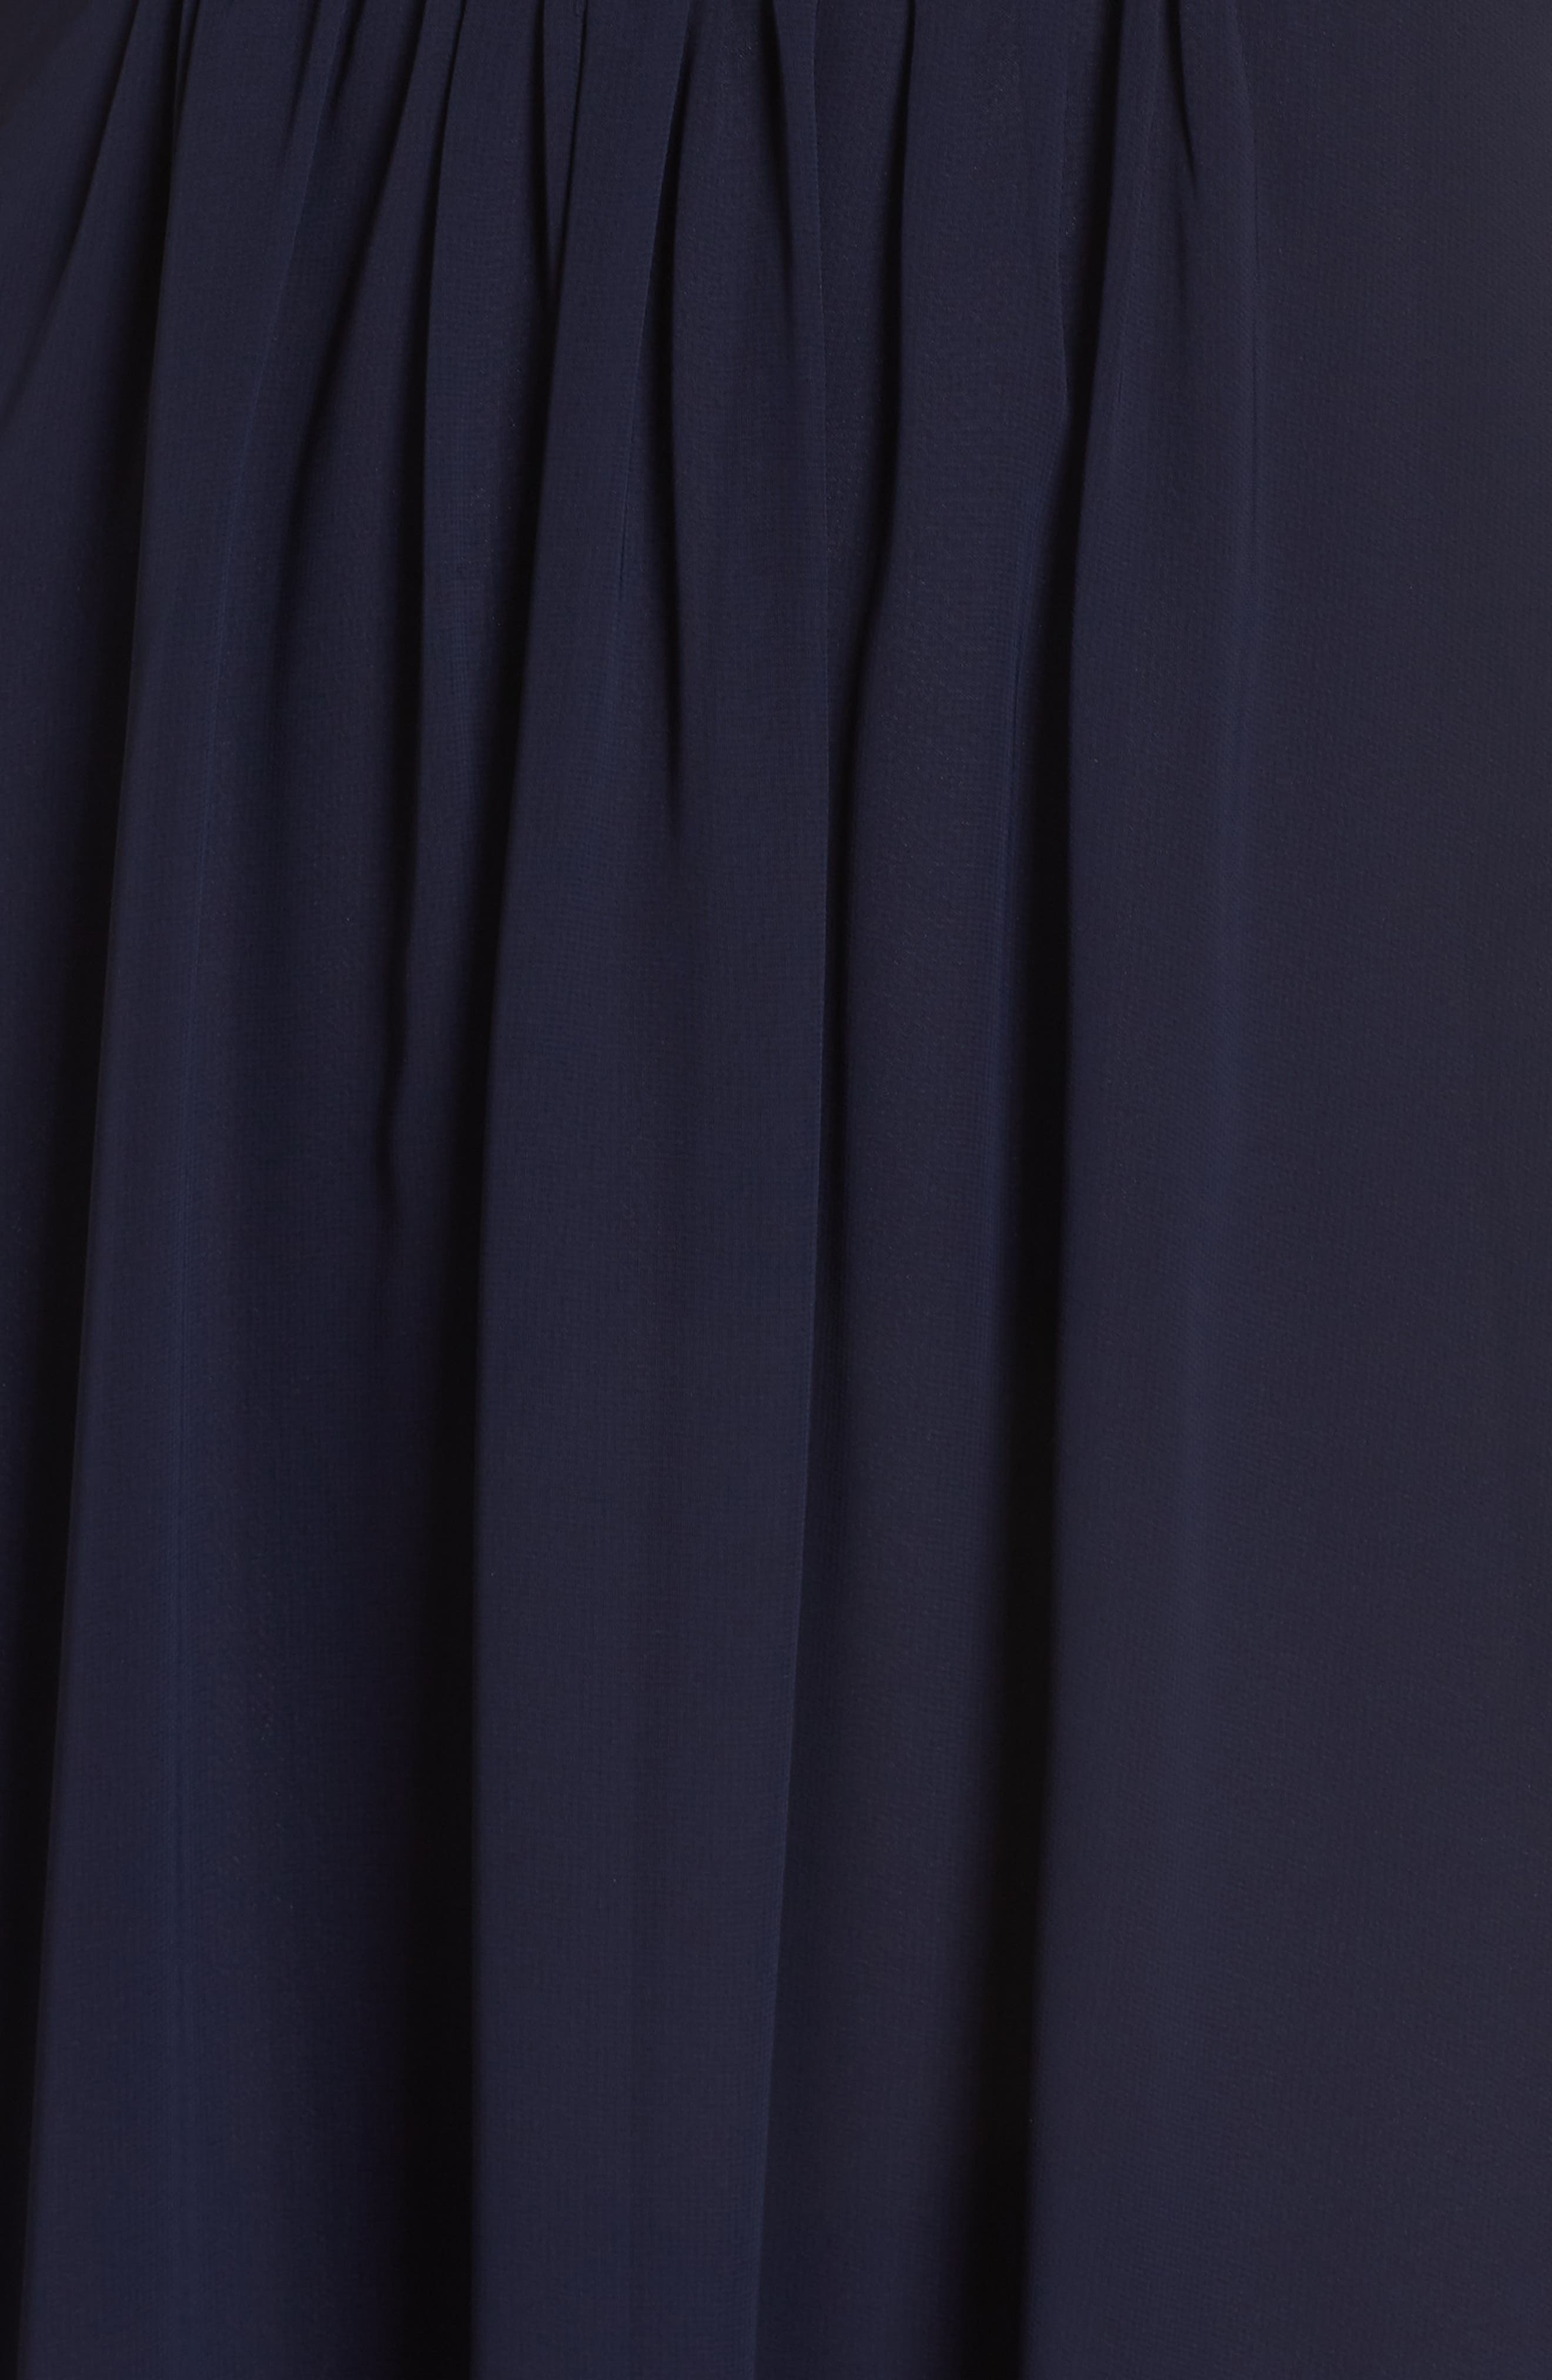 ELIZA J, Wrap Look High/Low Chiffon Dress, Alternate thumbnail 6, color, NAVY